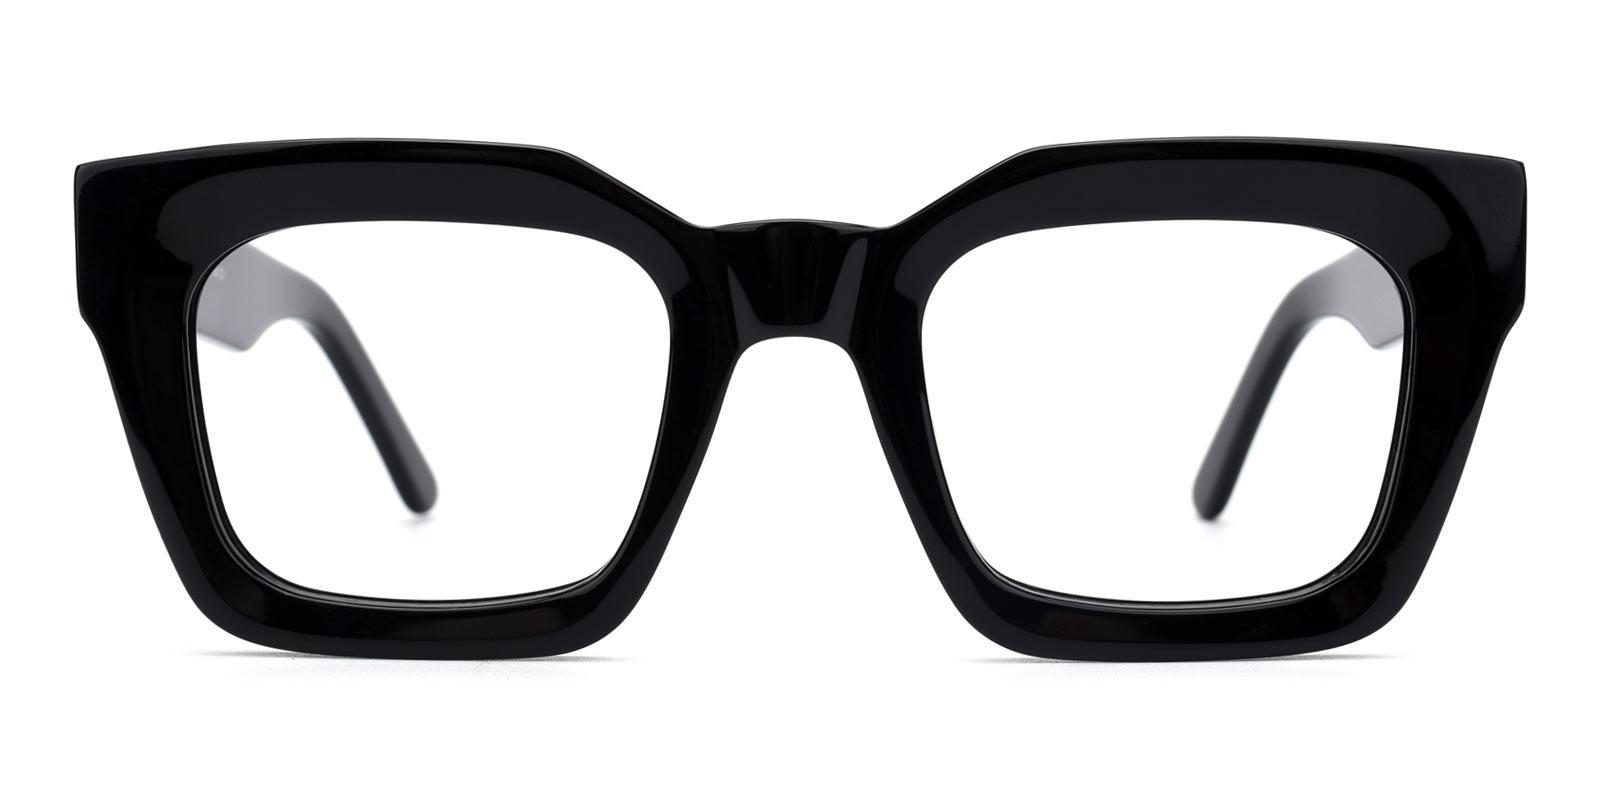 Esther-Black-Geometric-Acetate-Eyeglasses-additional2